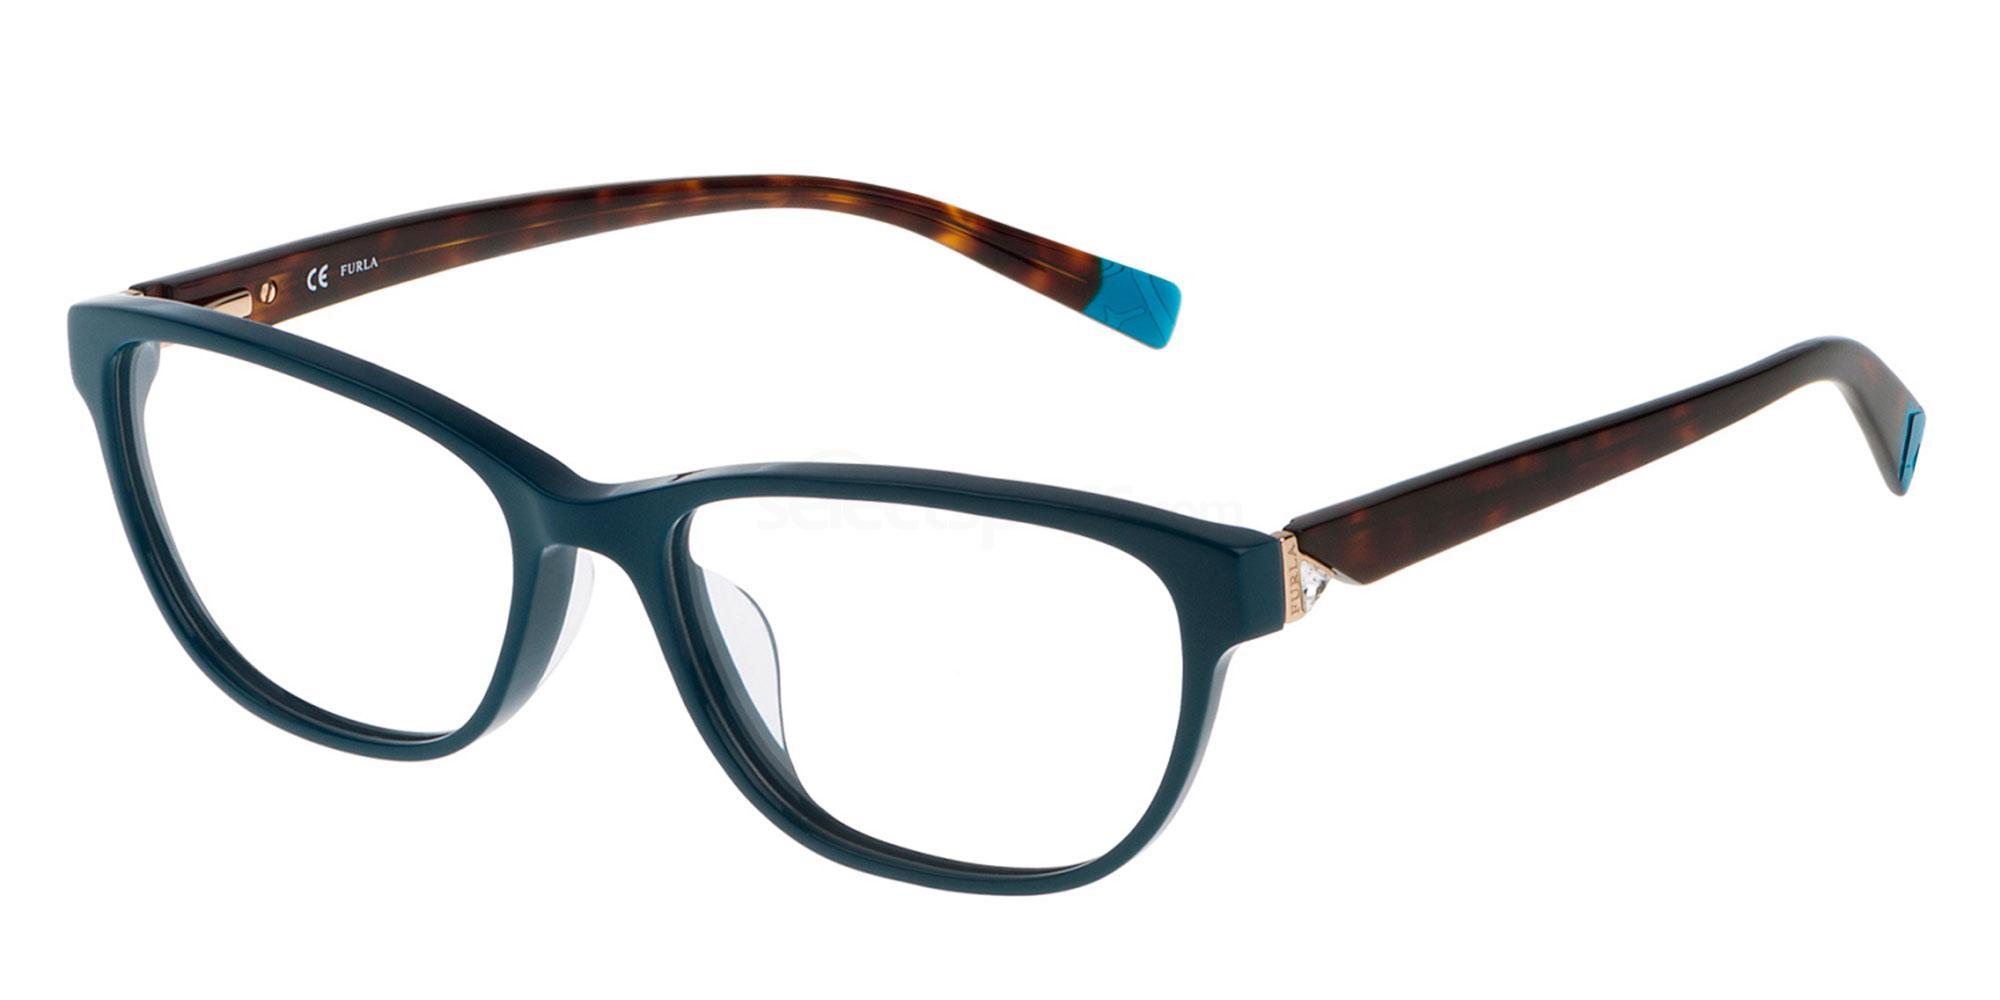 06MC VU4948R Glasses, Furla